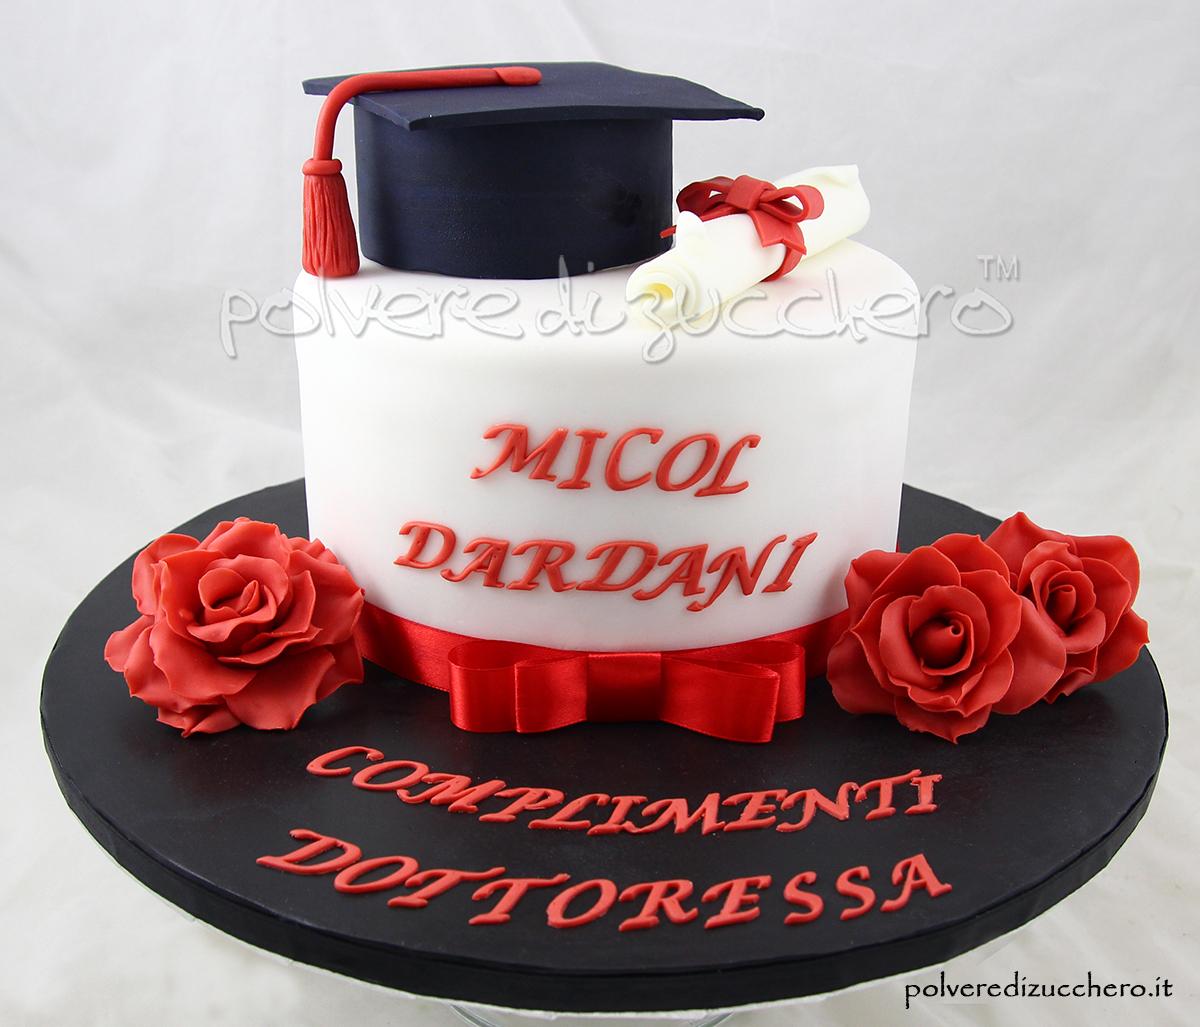 torta laurea cake design toco pergamena rose pasta di zucchero laurea dottoressa polvere di zucchero